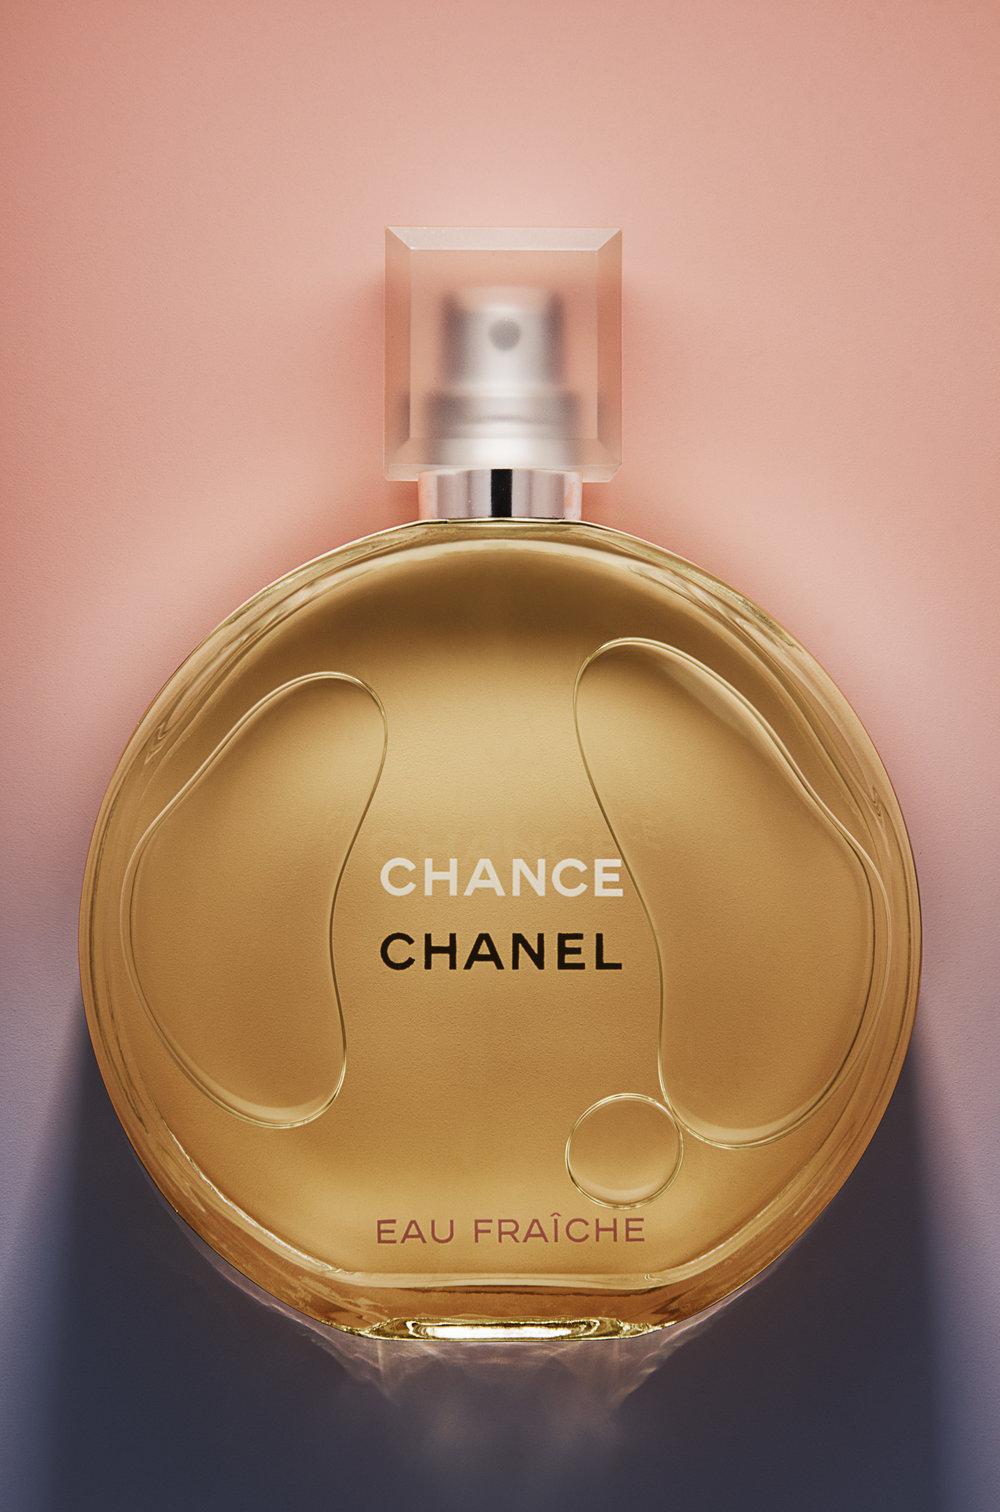 161119_Chanel Chance_339_B.jpg